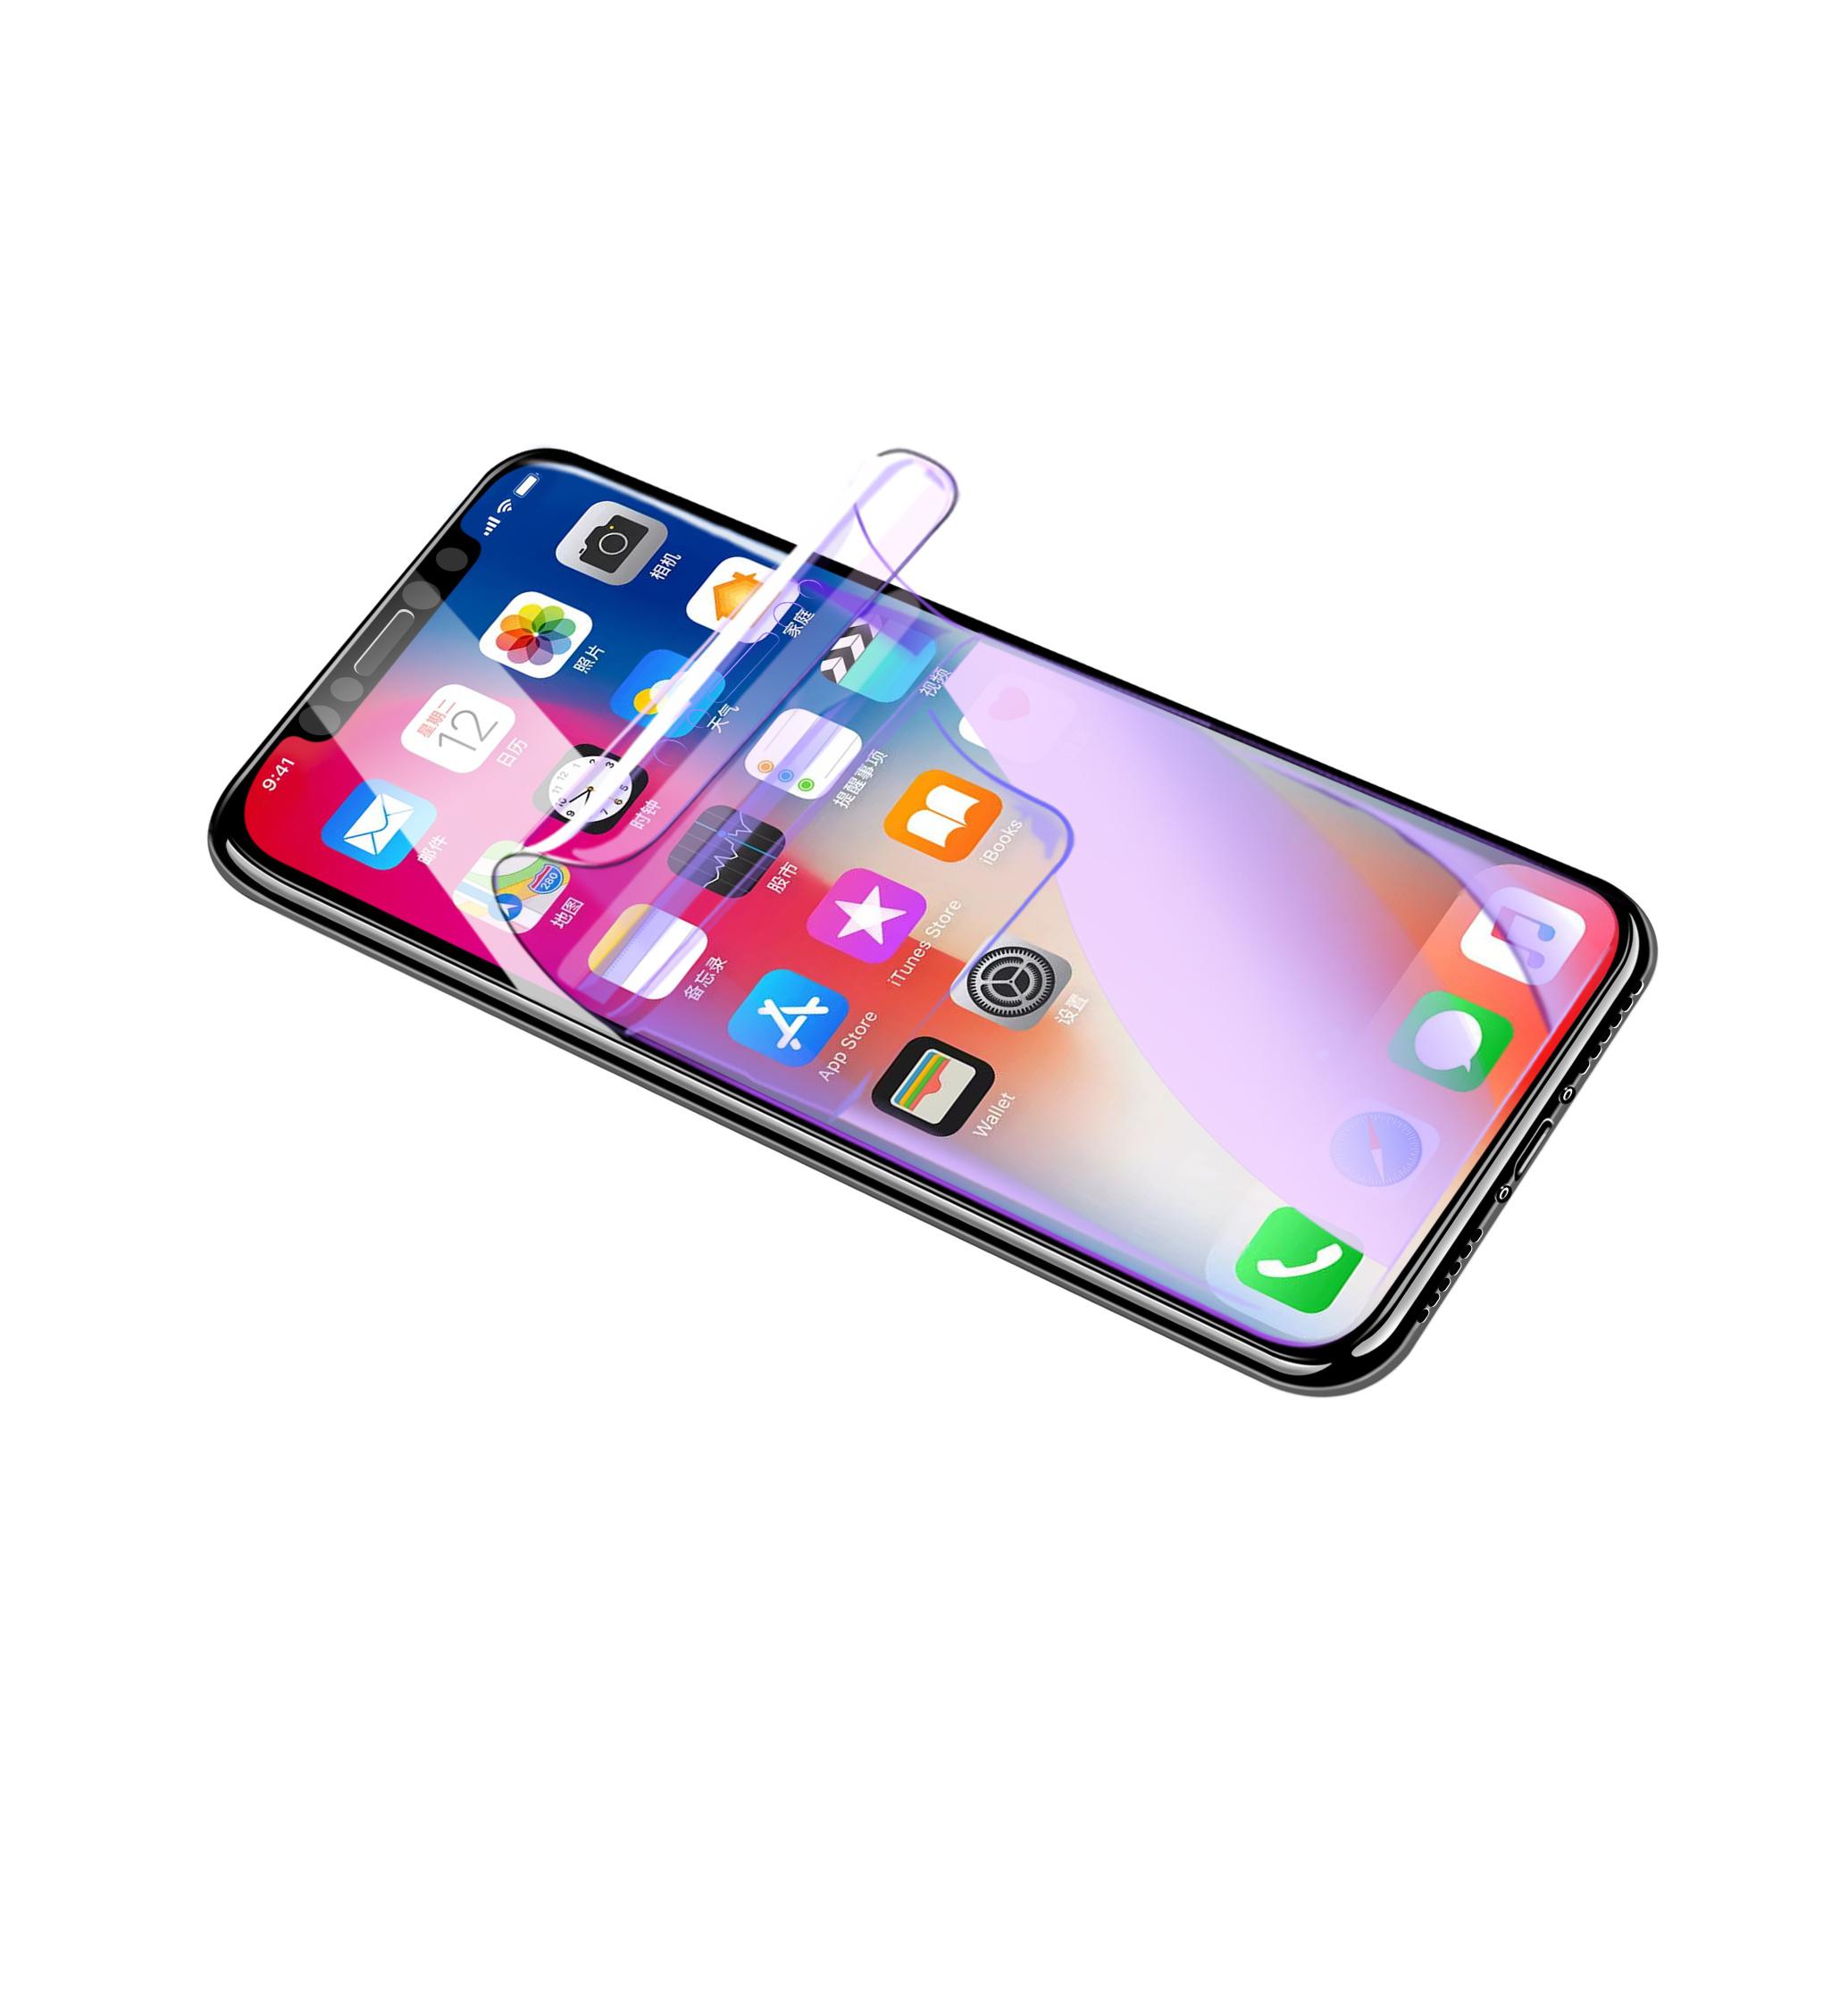 iPhoneX苹果手机产品精修修图水凝膜钢化膜背面侧面|网页|电商|Davis丶 - 原创作品 - 站酷 (ZCOOL)